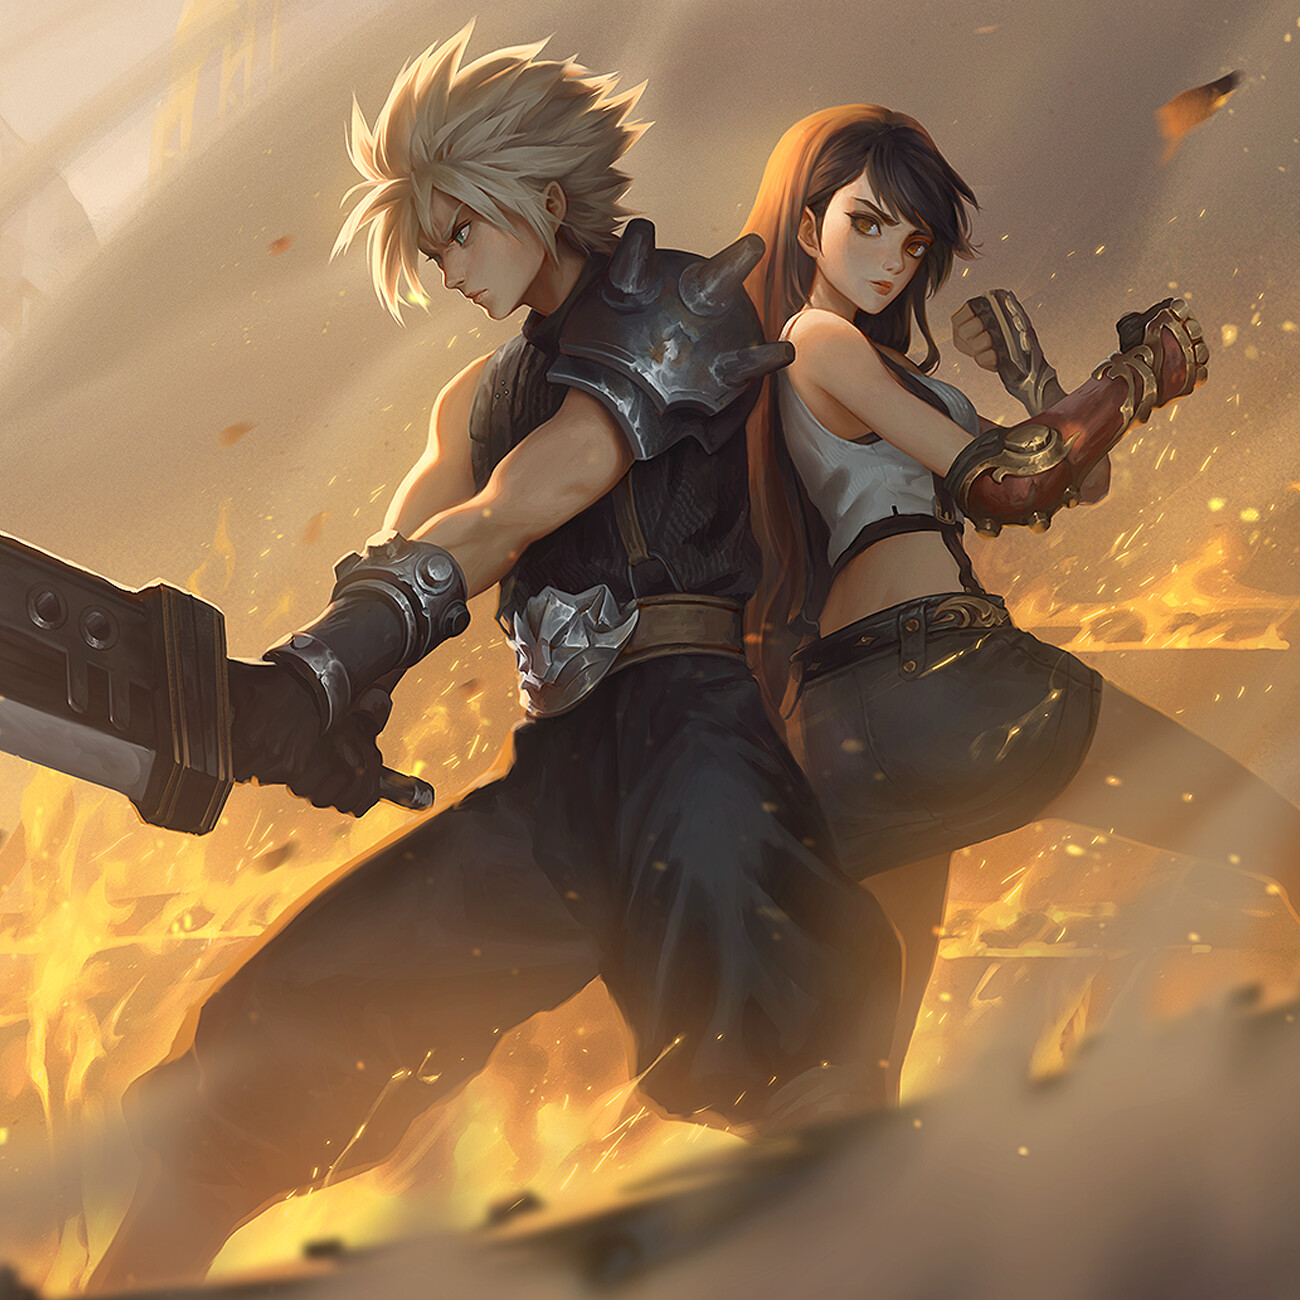 Final Fantasy 7 - Fanart